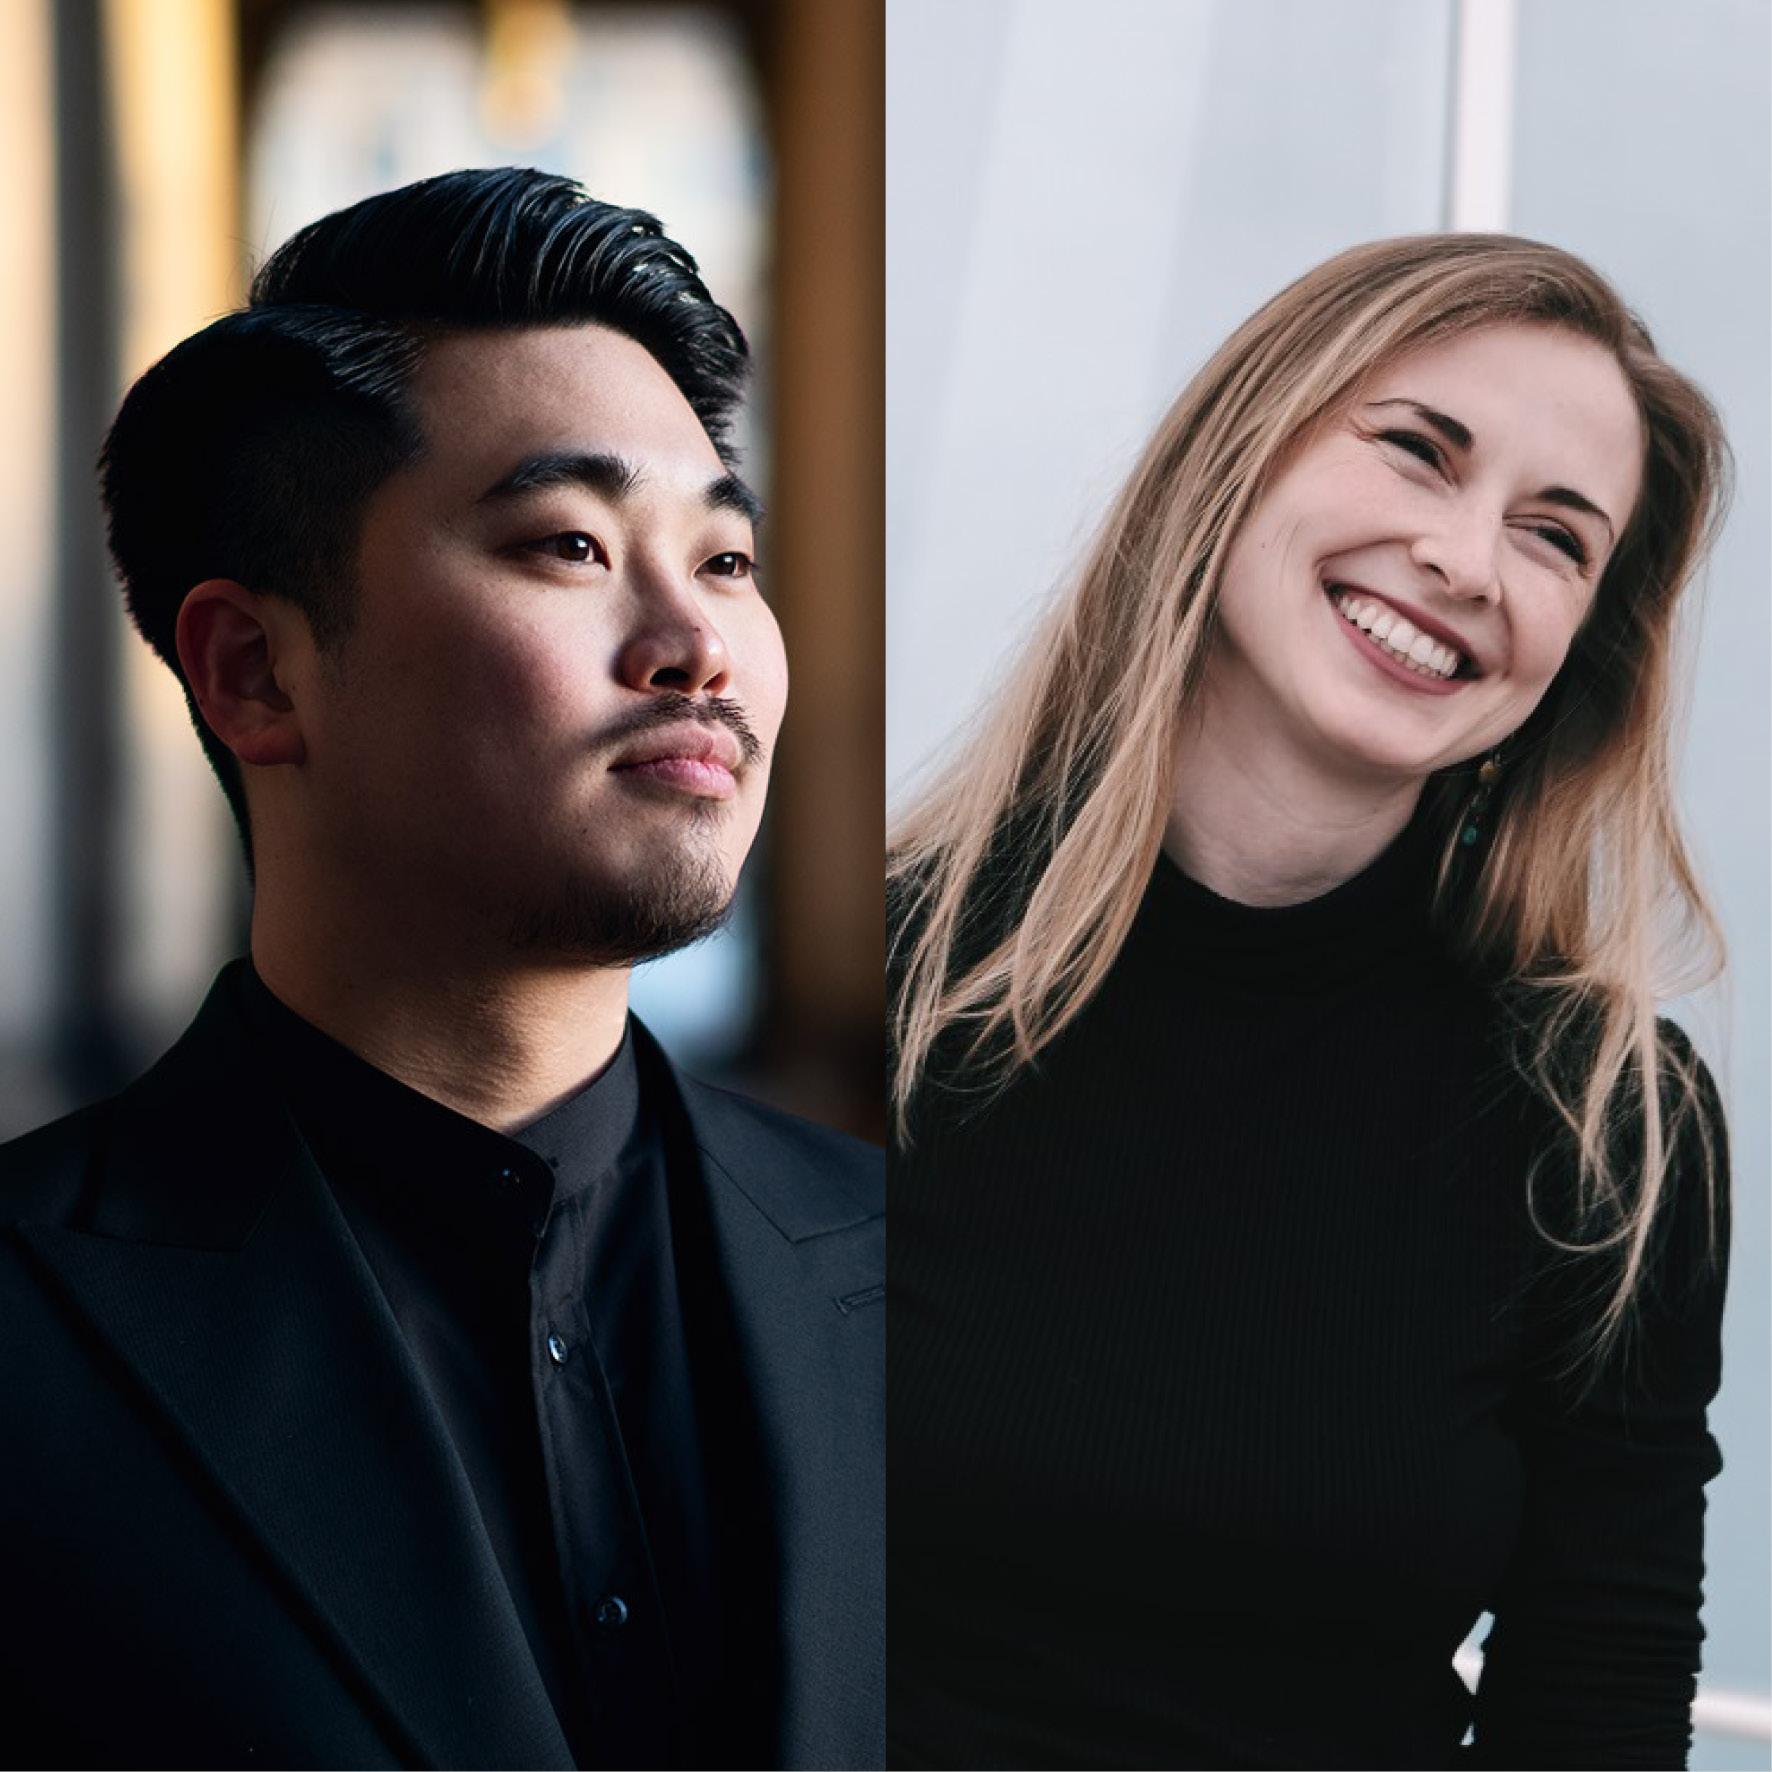 Duo 22: Jeeyoung Lim / Elenora Pertz